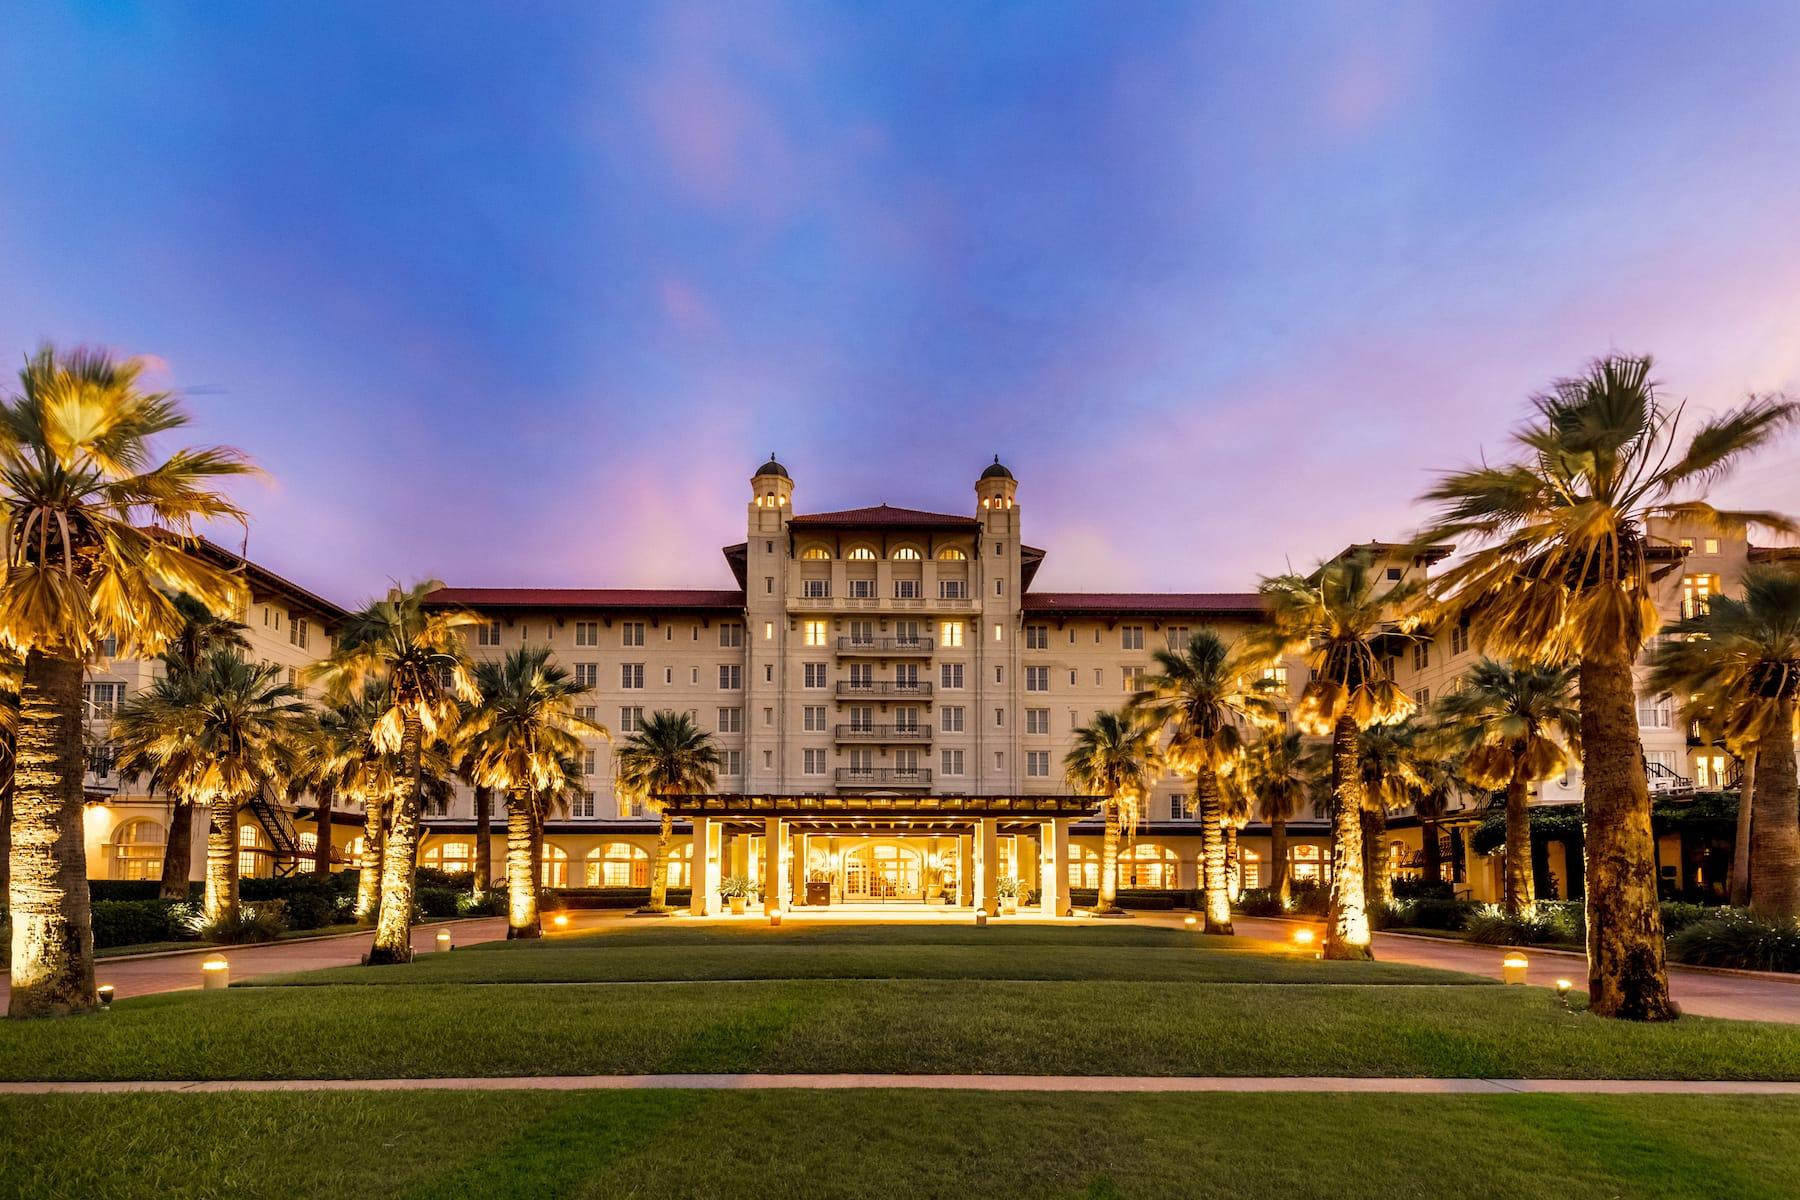 Exterior of Hotel Galvez & Spa A Wyndham Grand Hotel hotel in Galveston, Texas